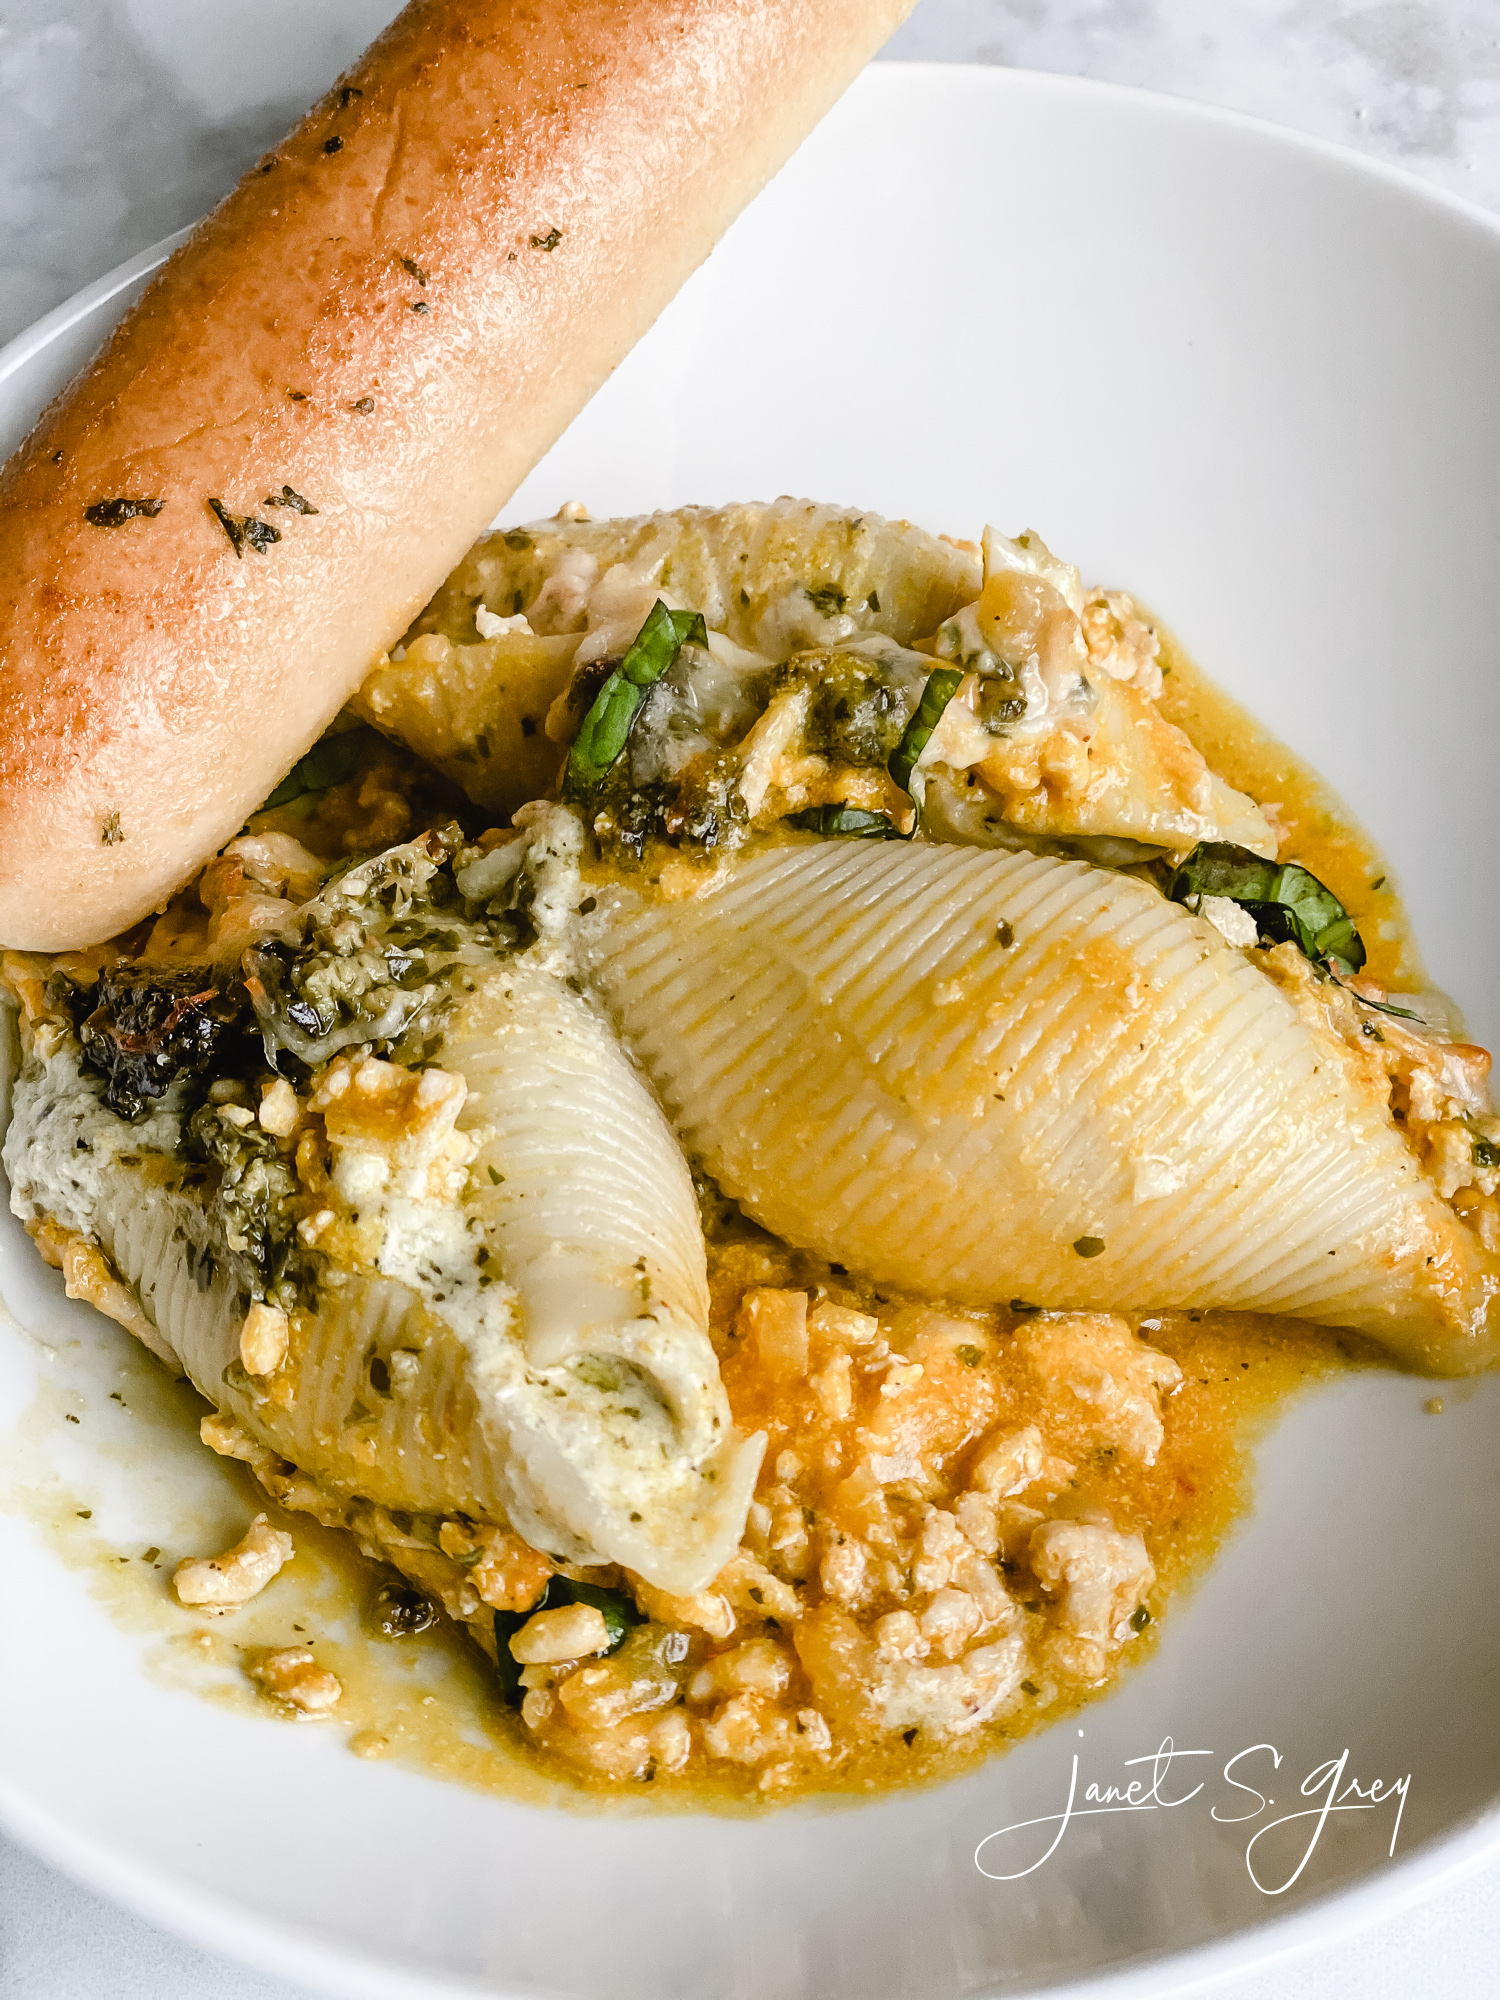 Ricotta and Pesto Stuffed Shells with Kabocha Squash Ground Chicken Sauce